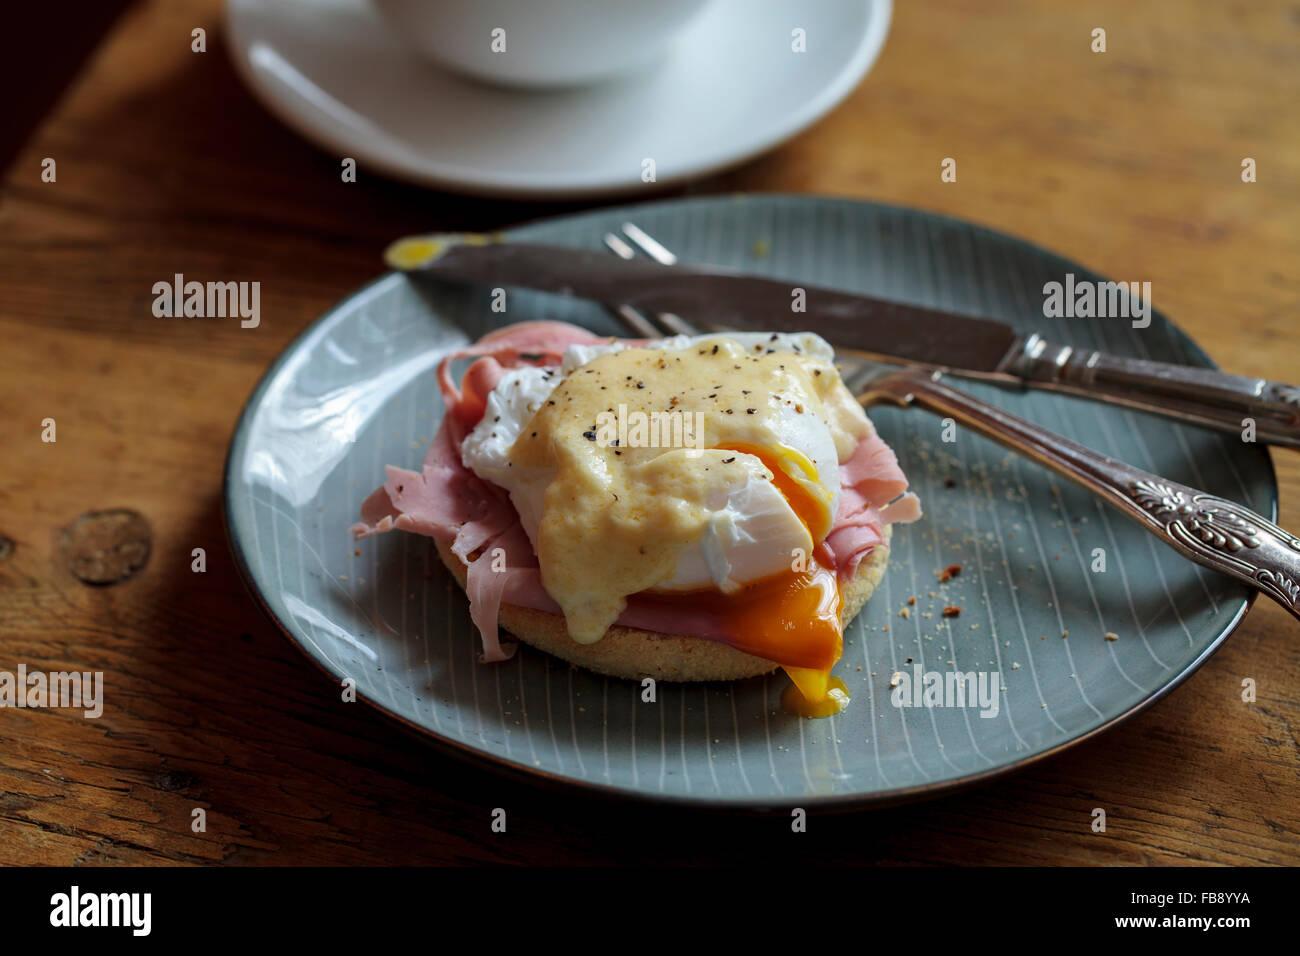 Egg benedict - Stock Image